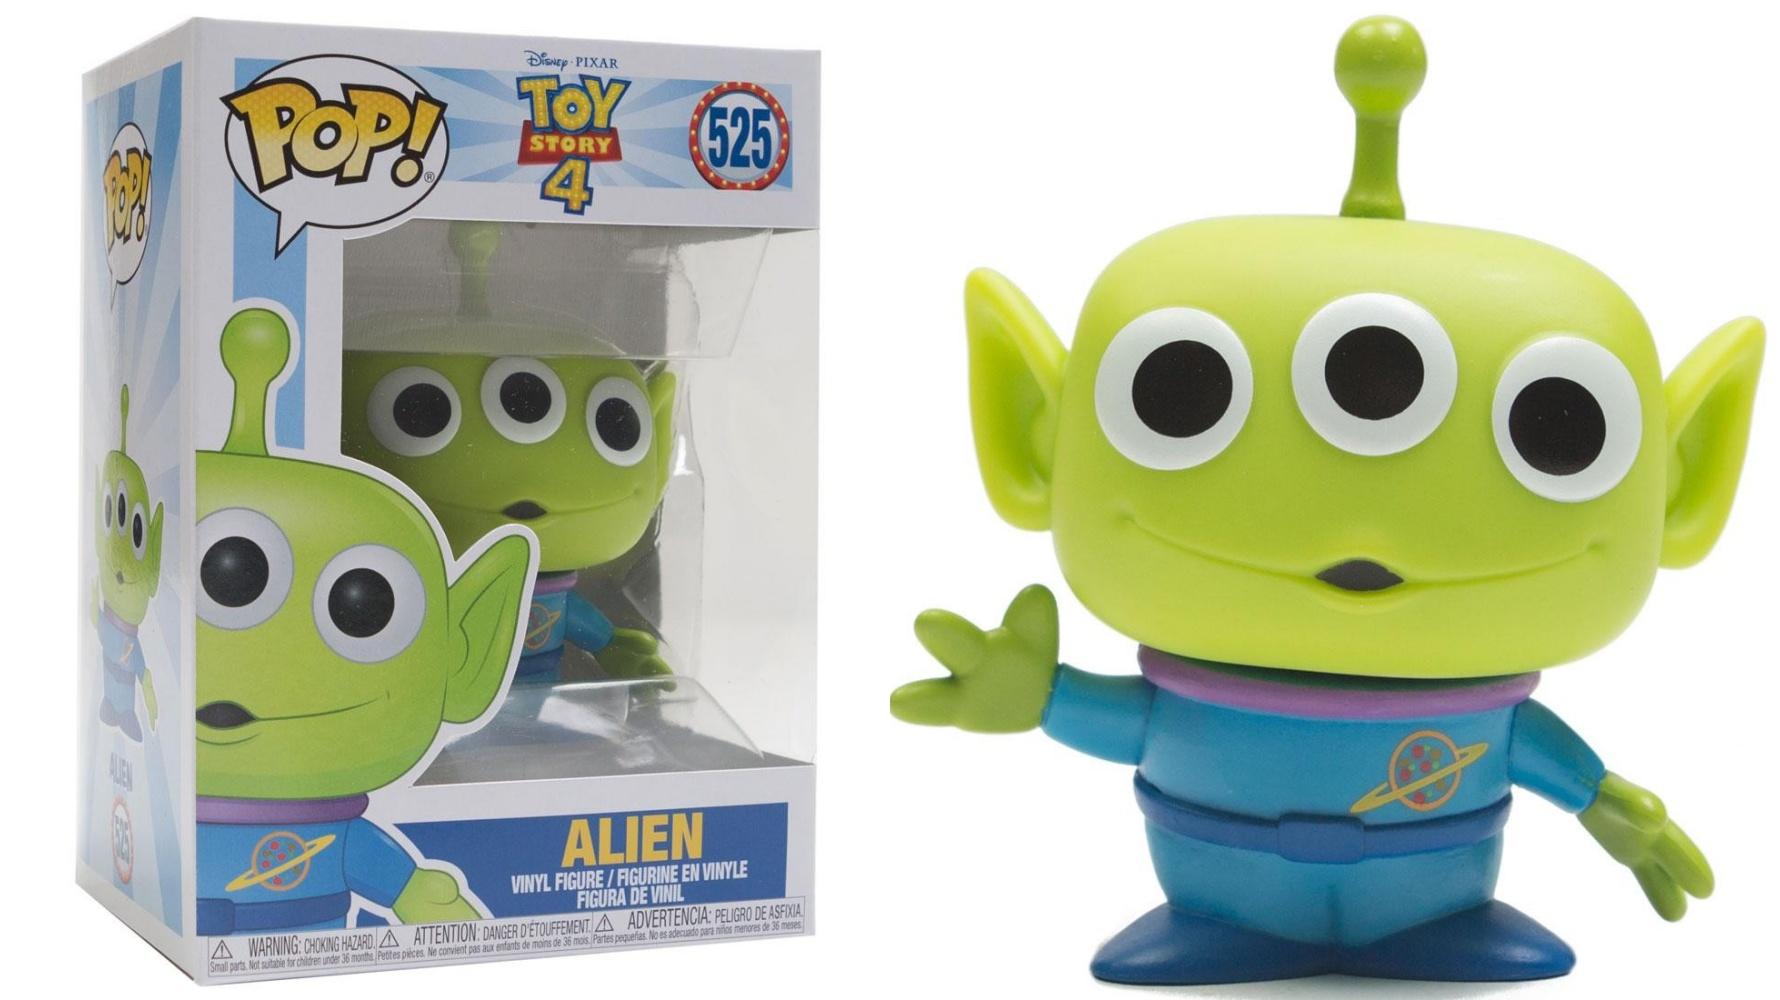 Funko Pop Disney Pixar TOY STORY 4 Duke caboom Vinyl Figure objet #37397